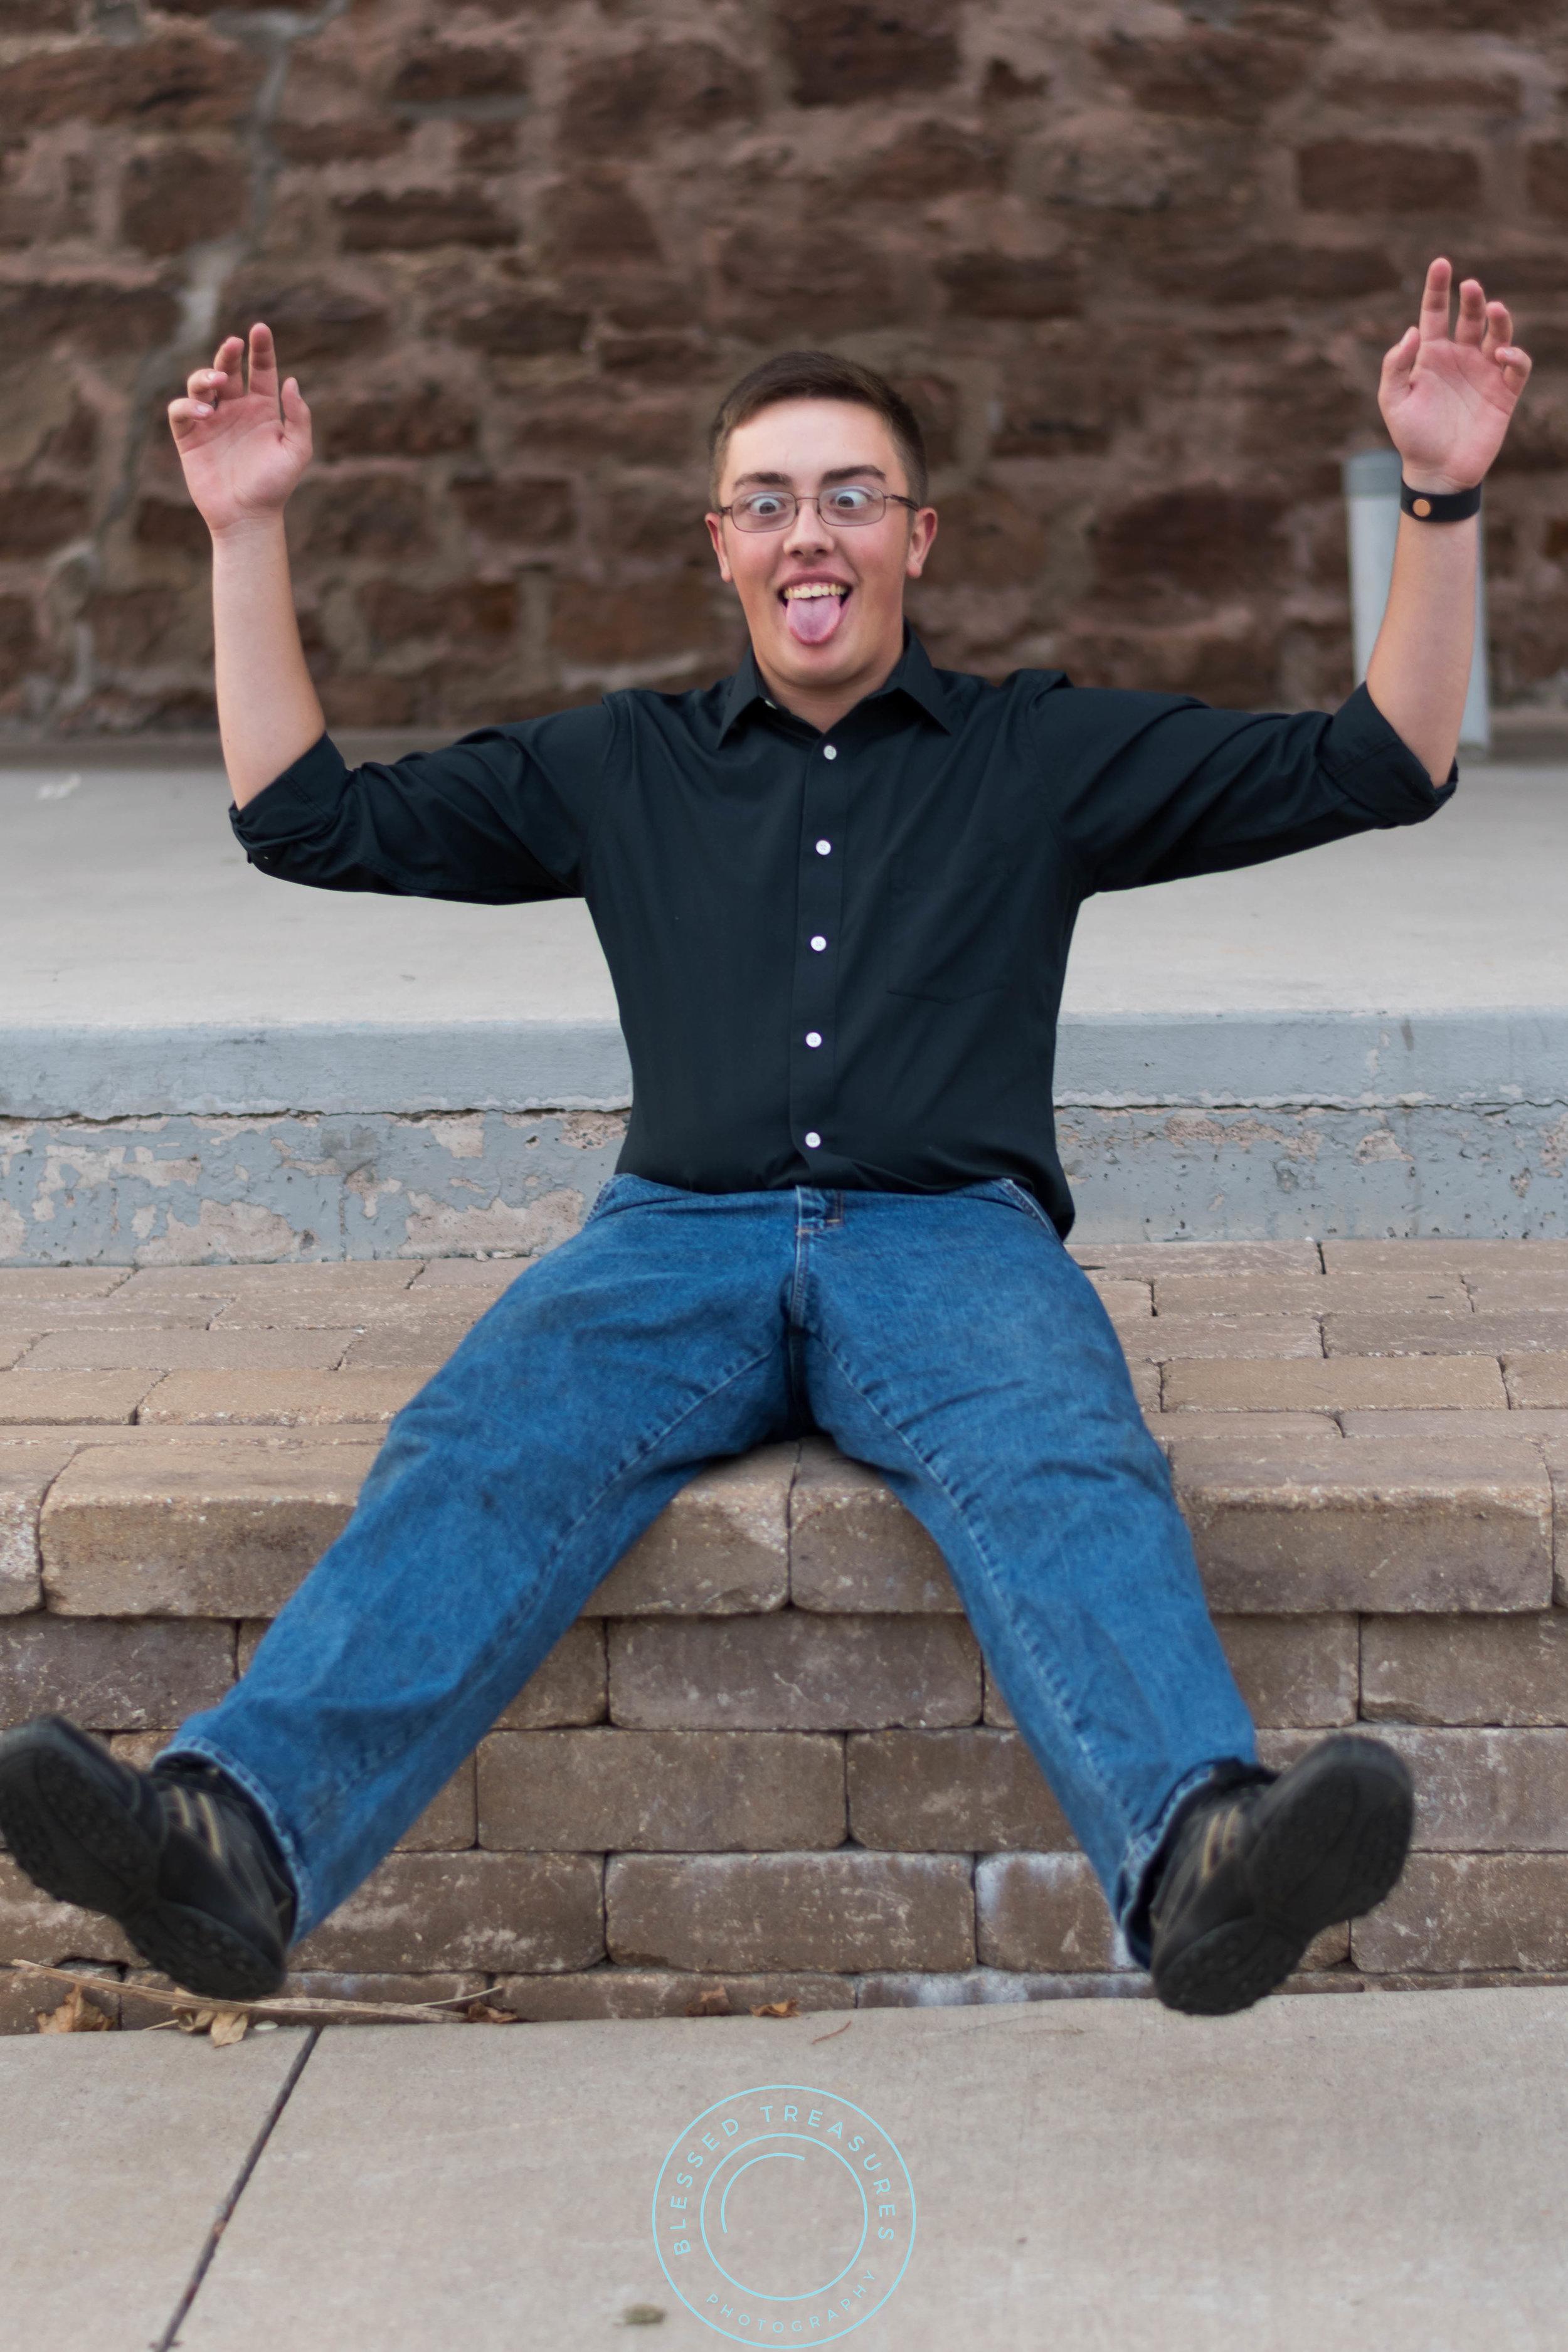 Andrew Navis senior session Iron Mountain downtown funny rustic edgy brick vintage